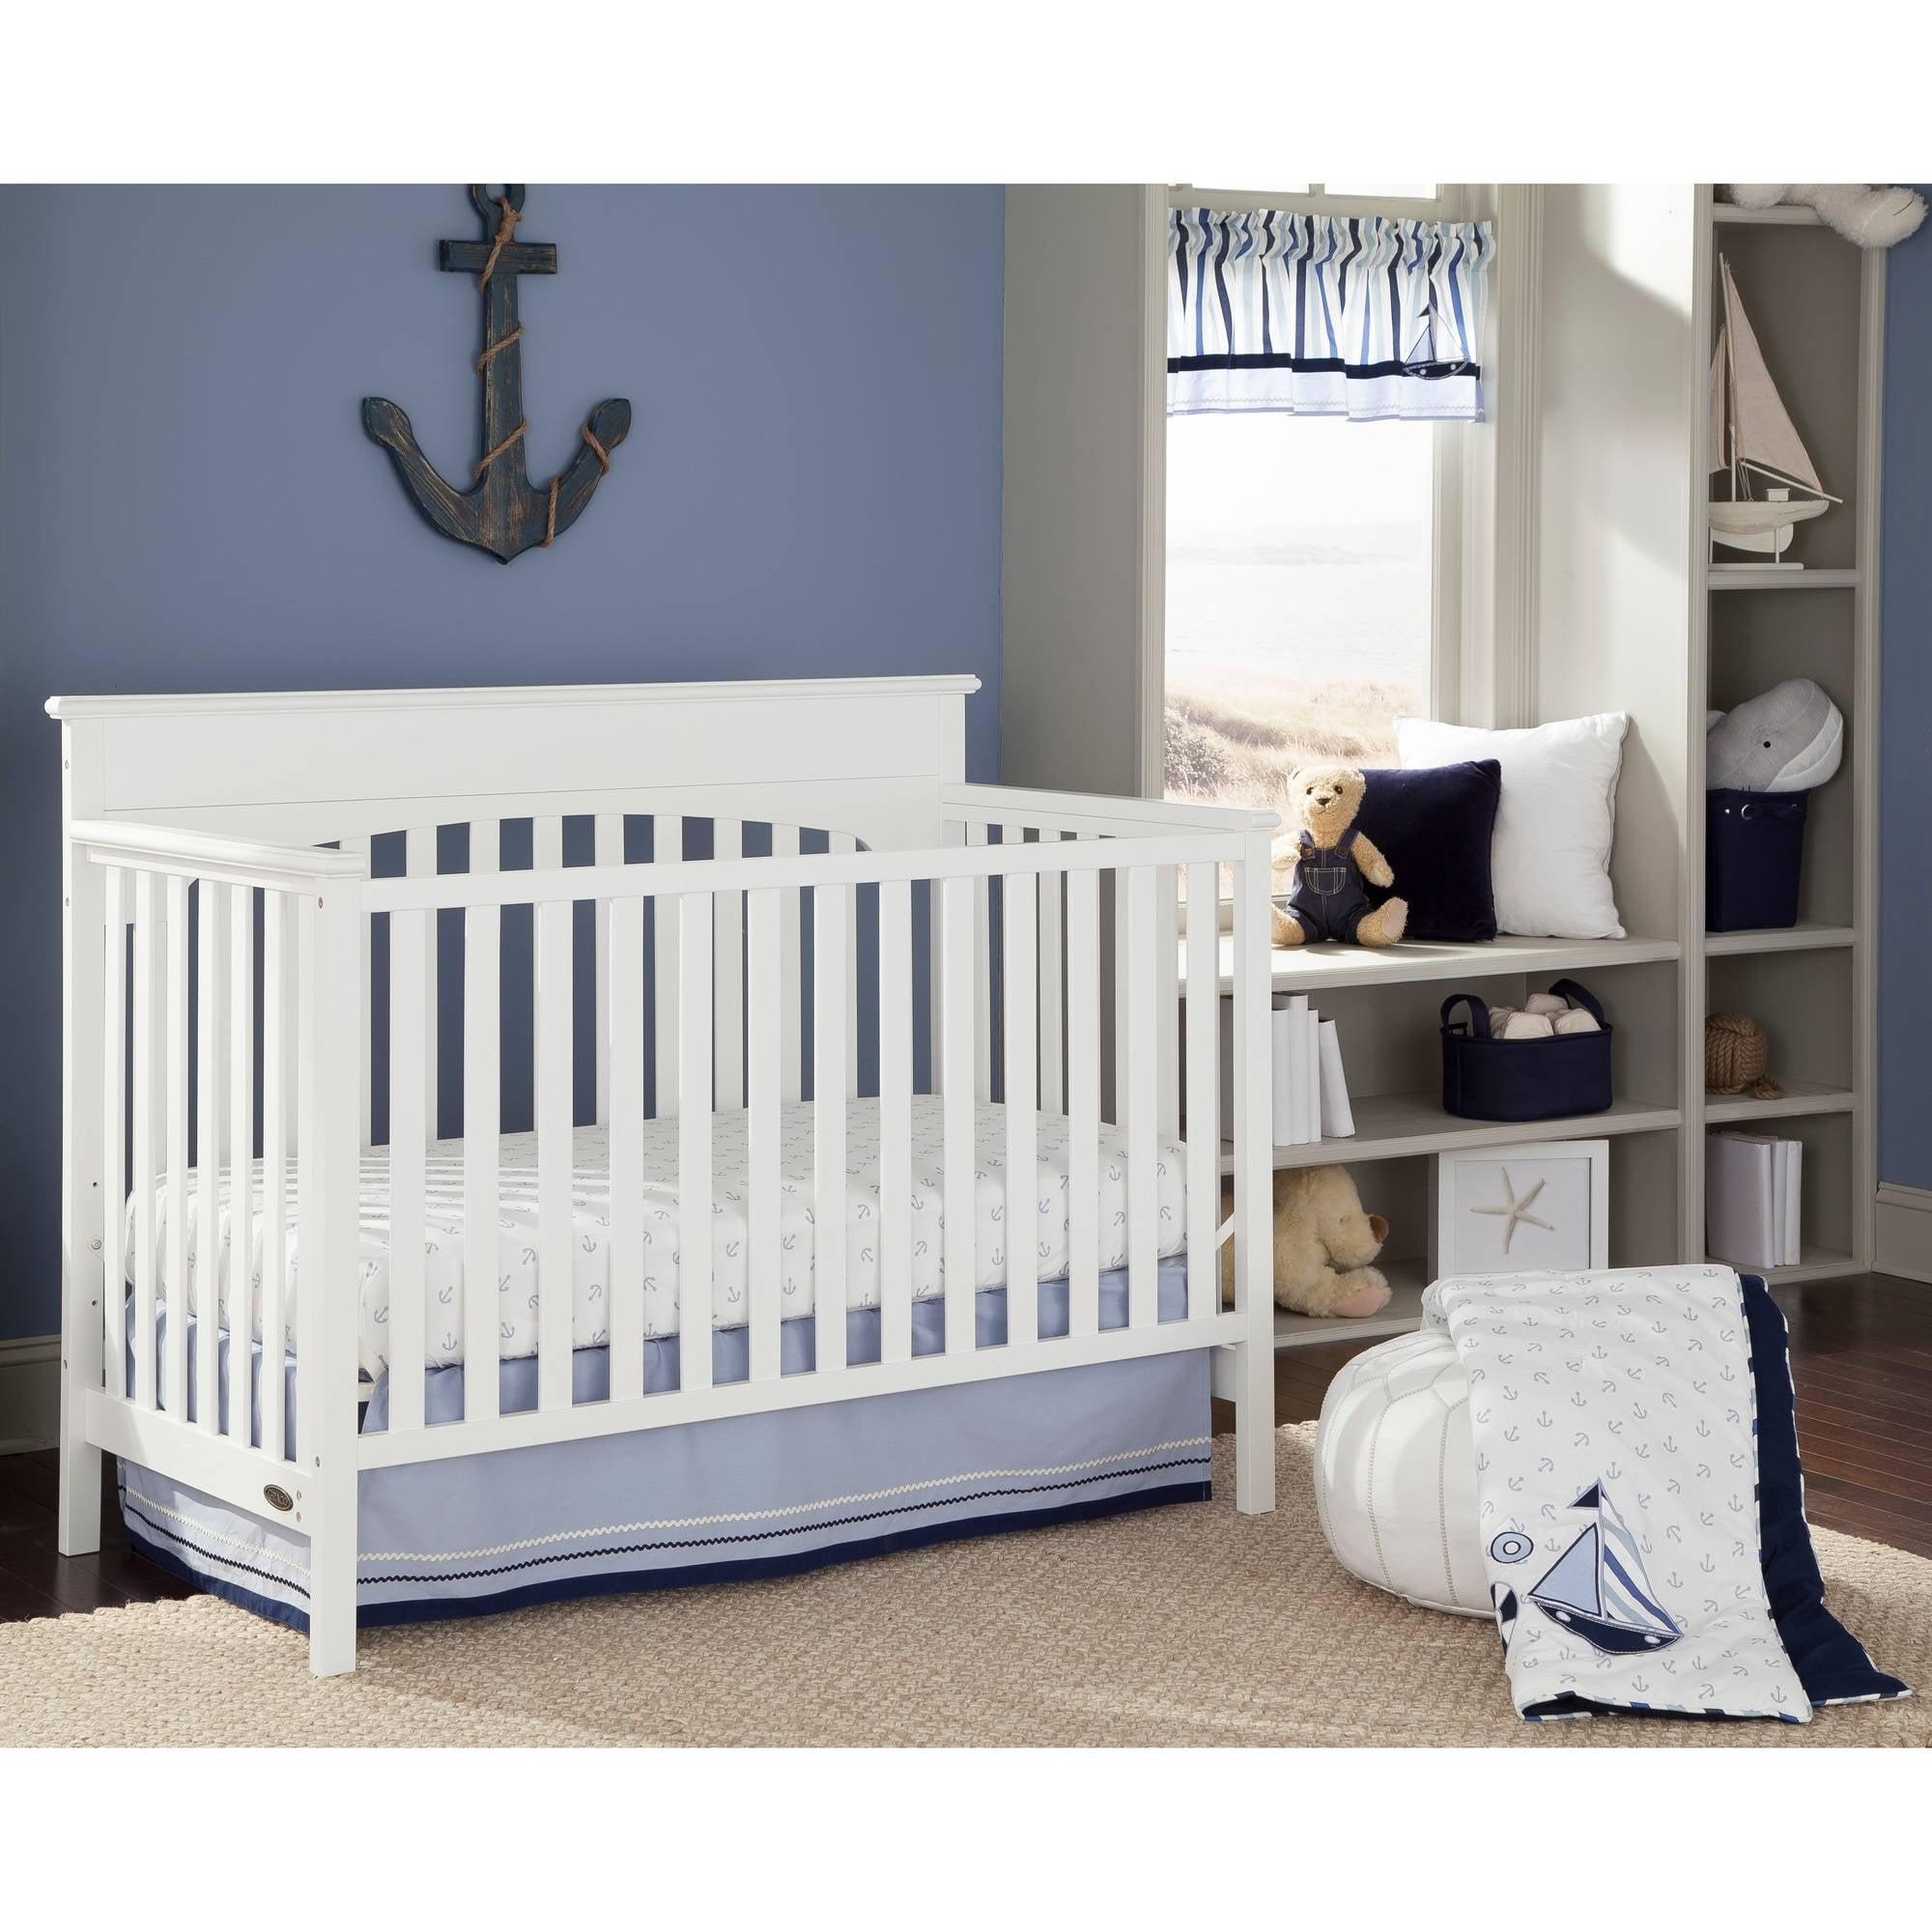 Graco Lauren 4-in-1 Convertible Crib, Choose Your Finish